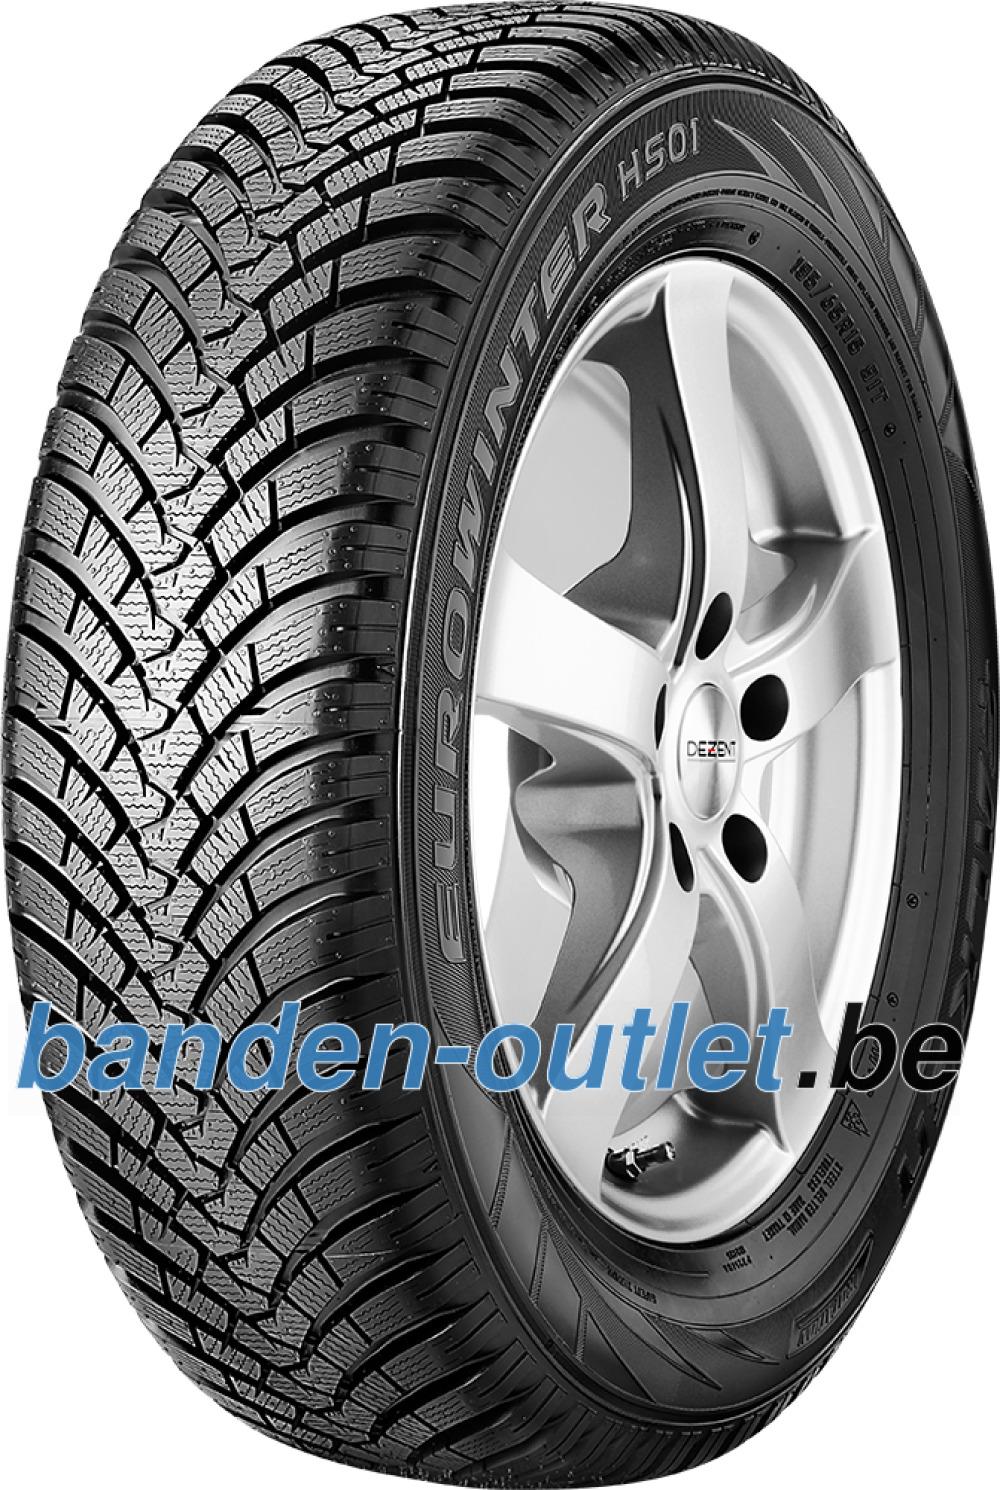 Falken Eurowinter HS01 ( 195/55 R15 85H )